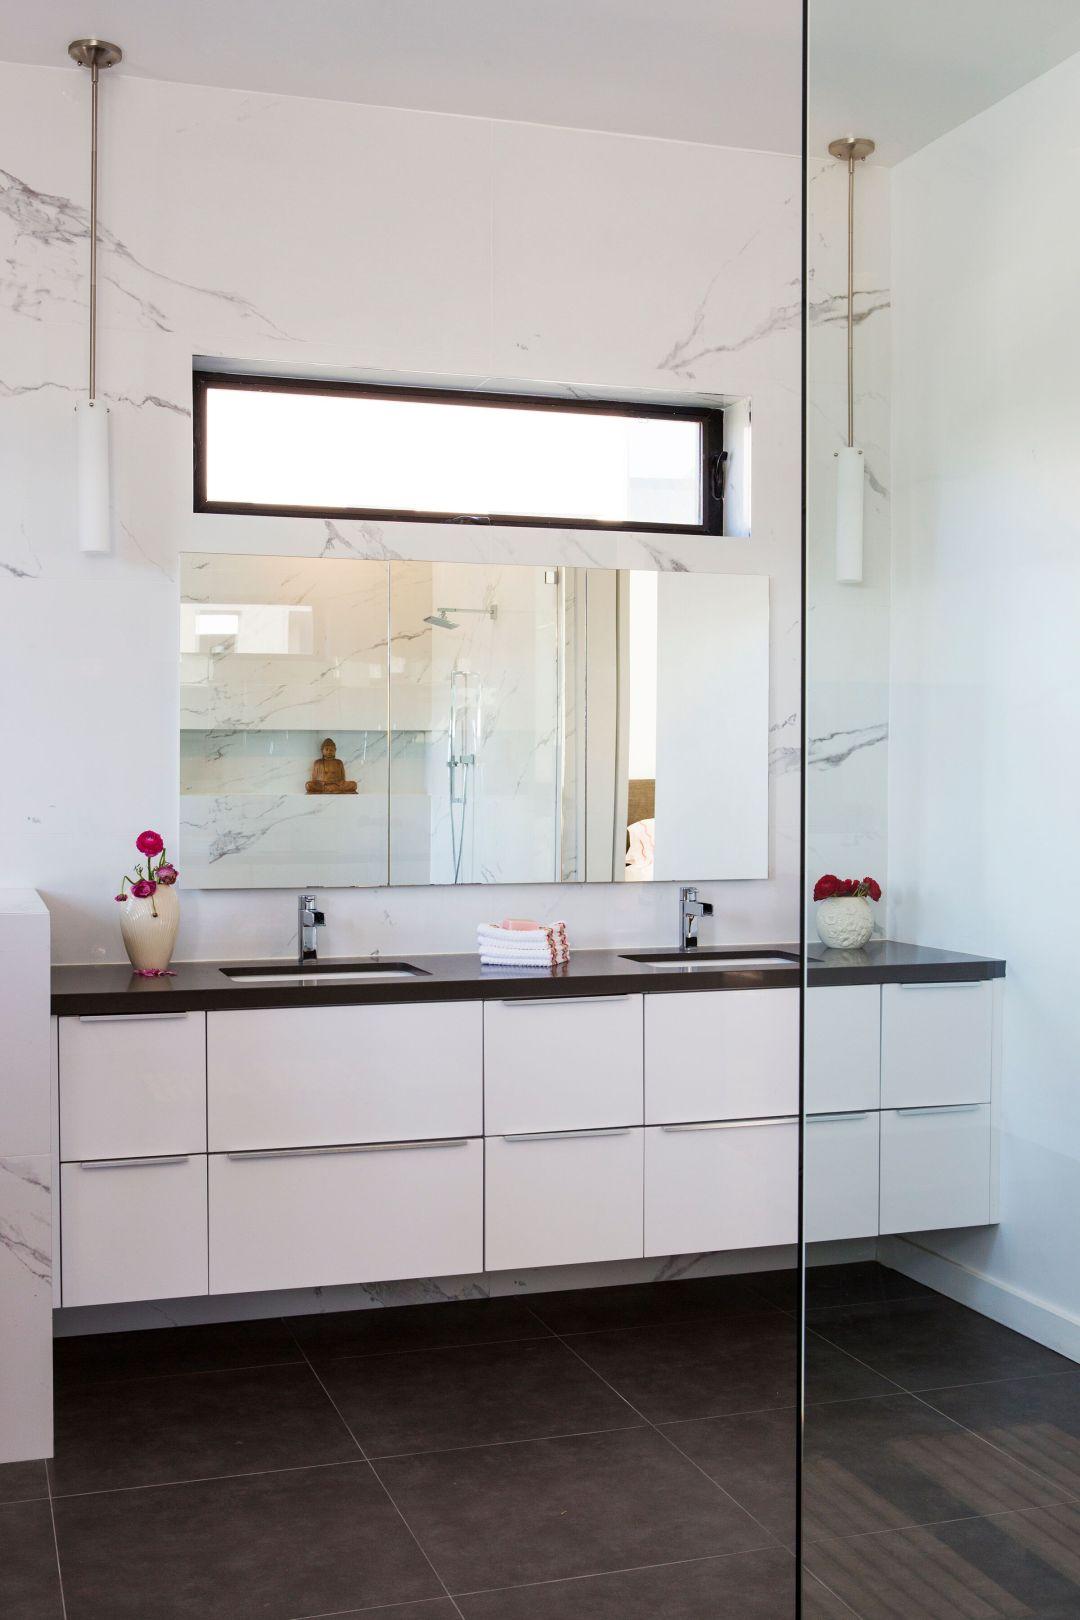 eco friendly bath products fill this modern bathroom in Venice Beach